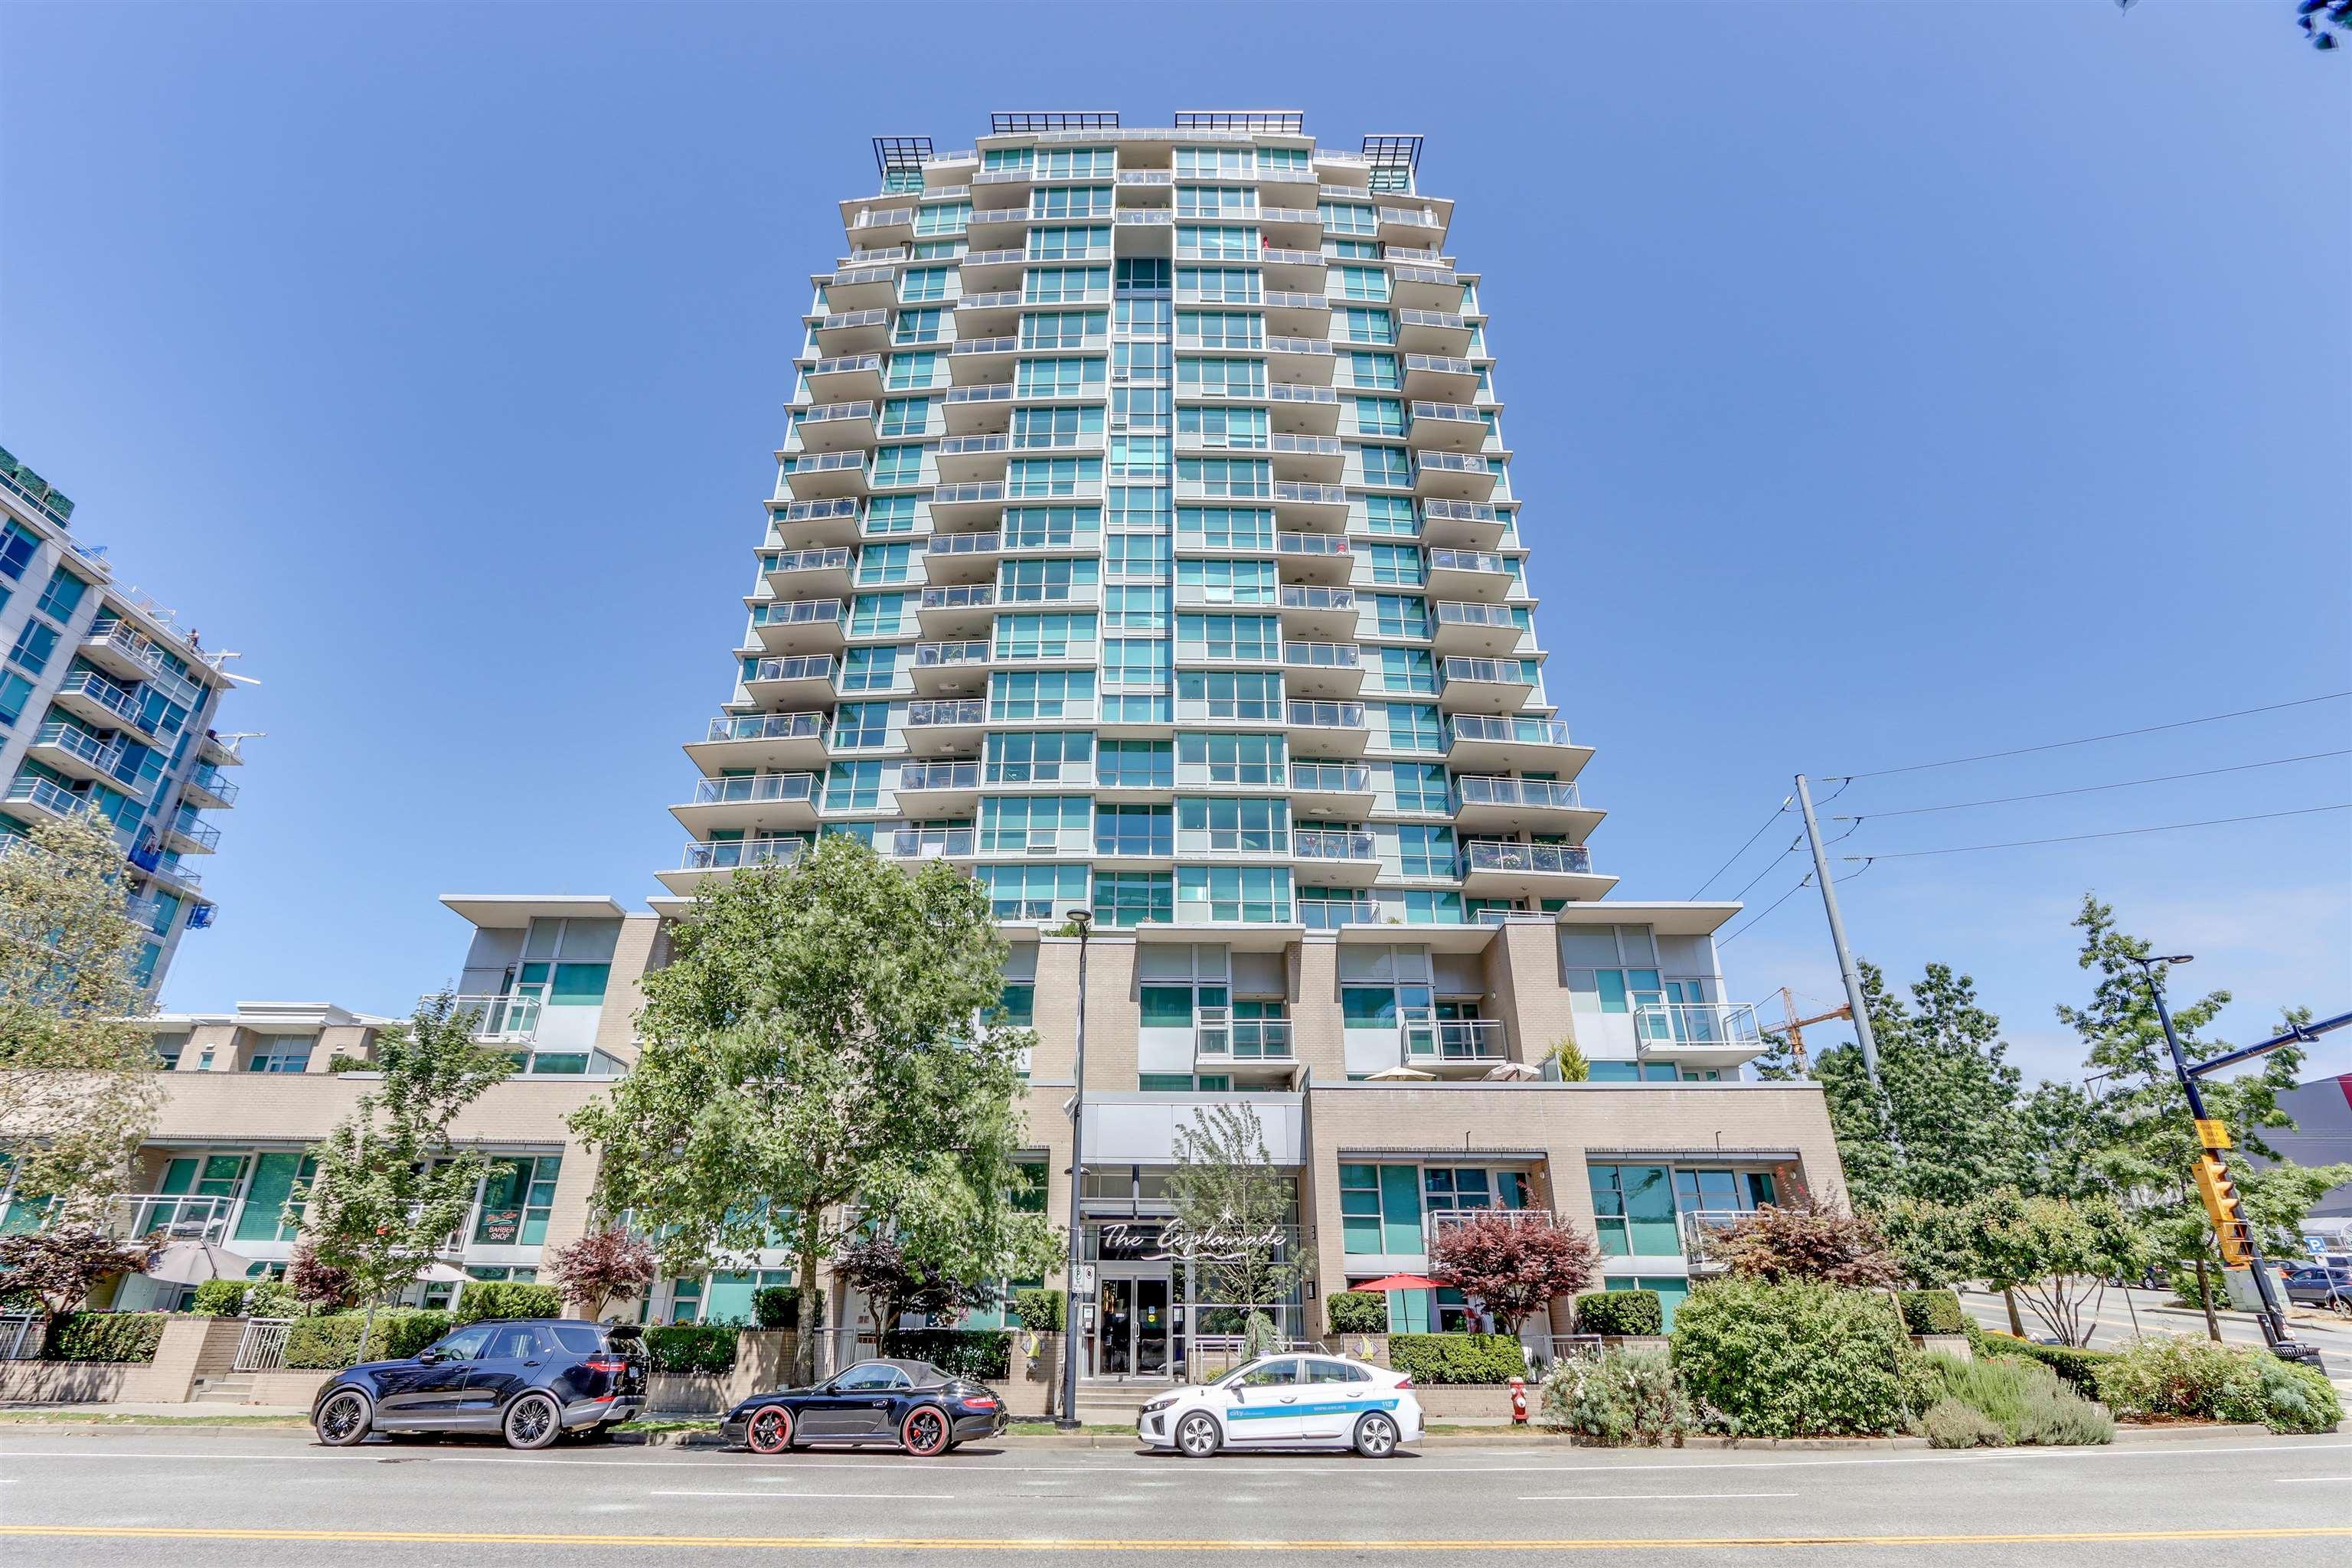 2202 188 E ESPLANADE - Lower Lonsdale Apartment/Condo for sale, 2 Bedrooms (R2618412) - #22